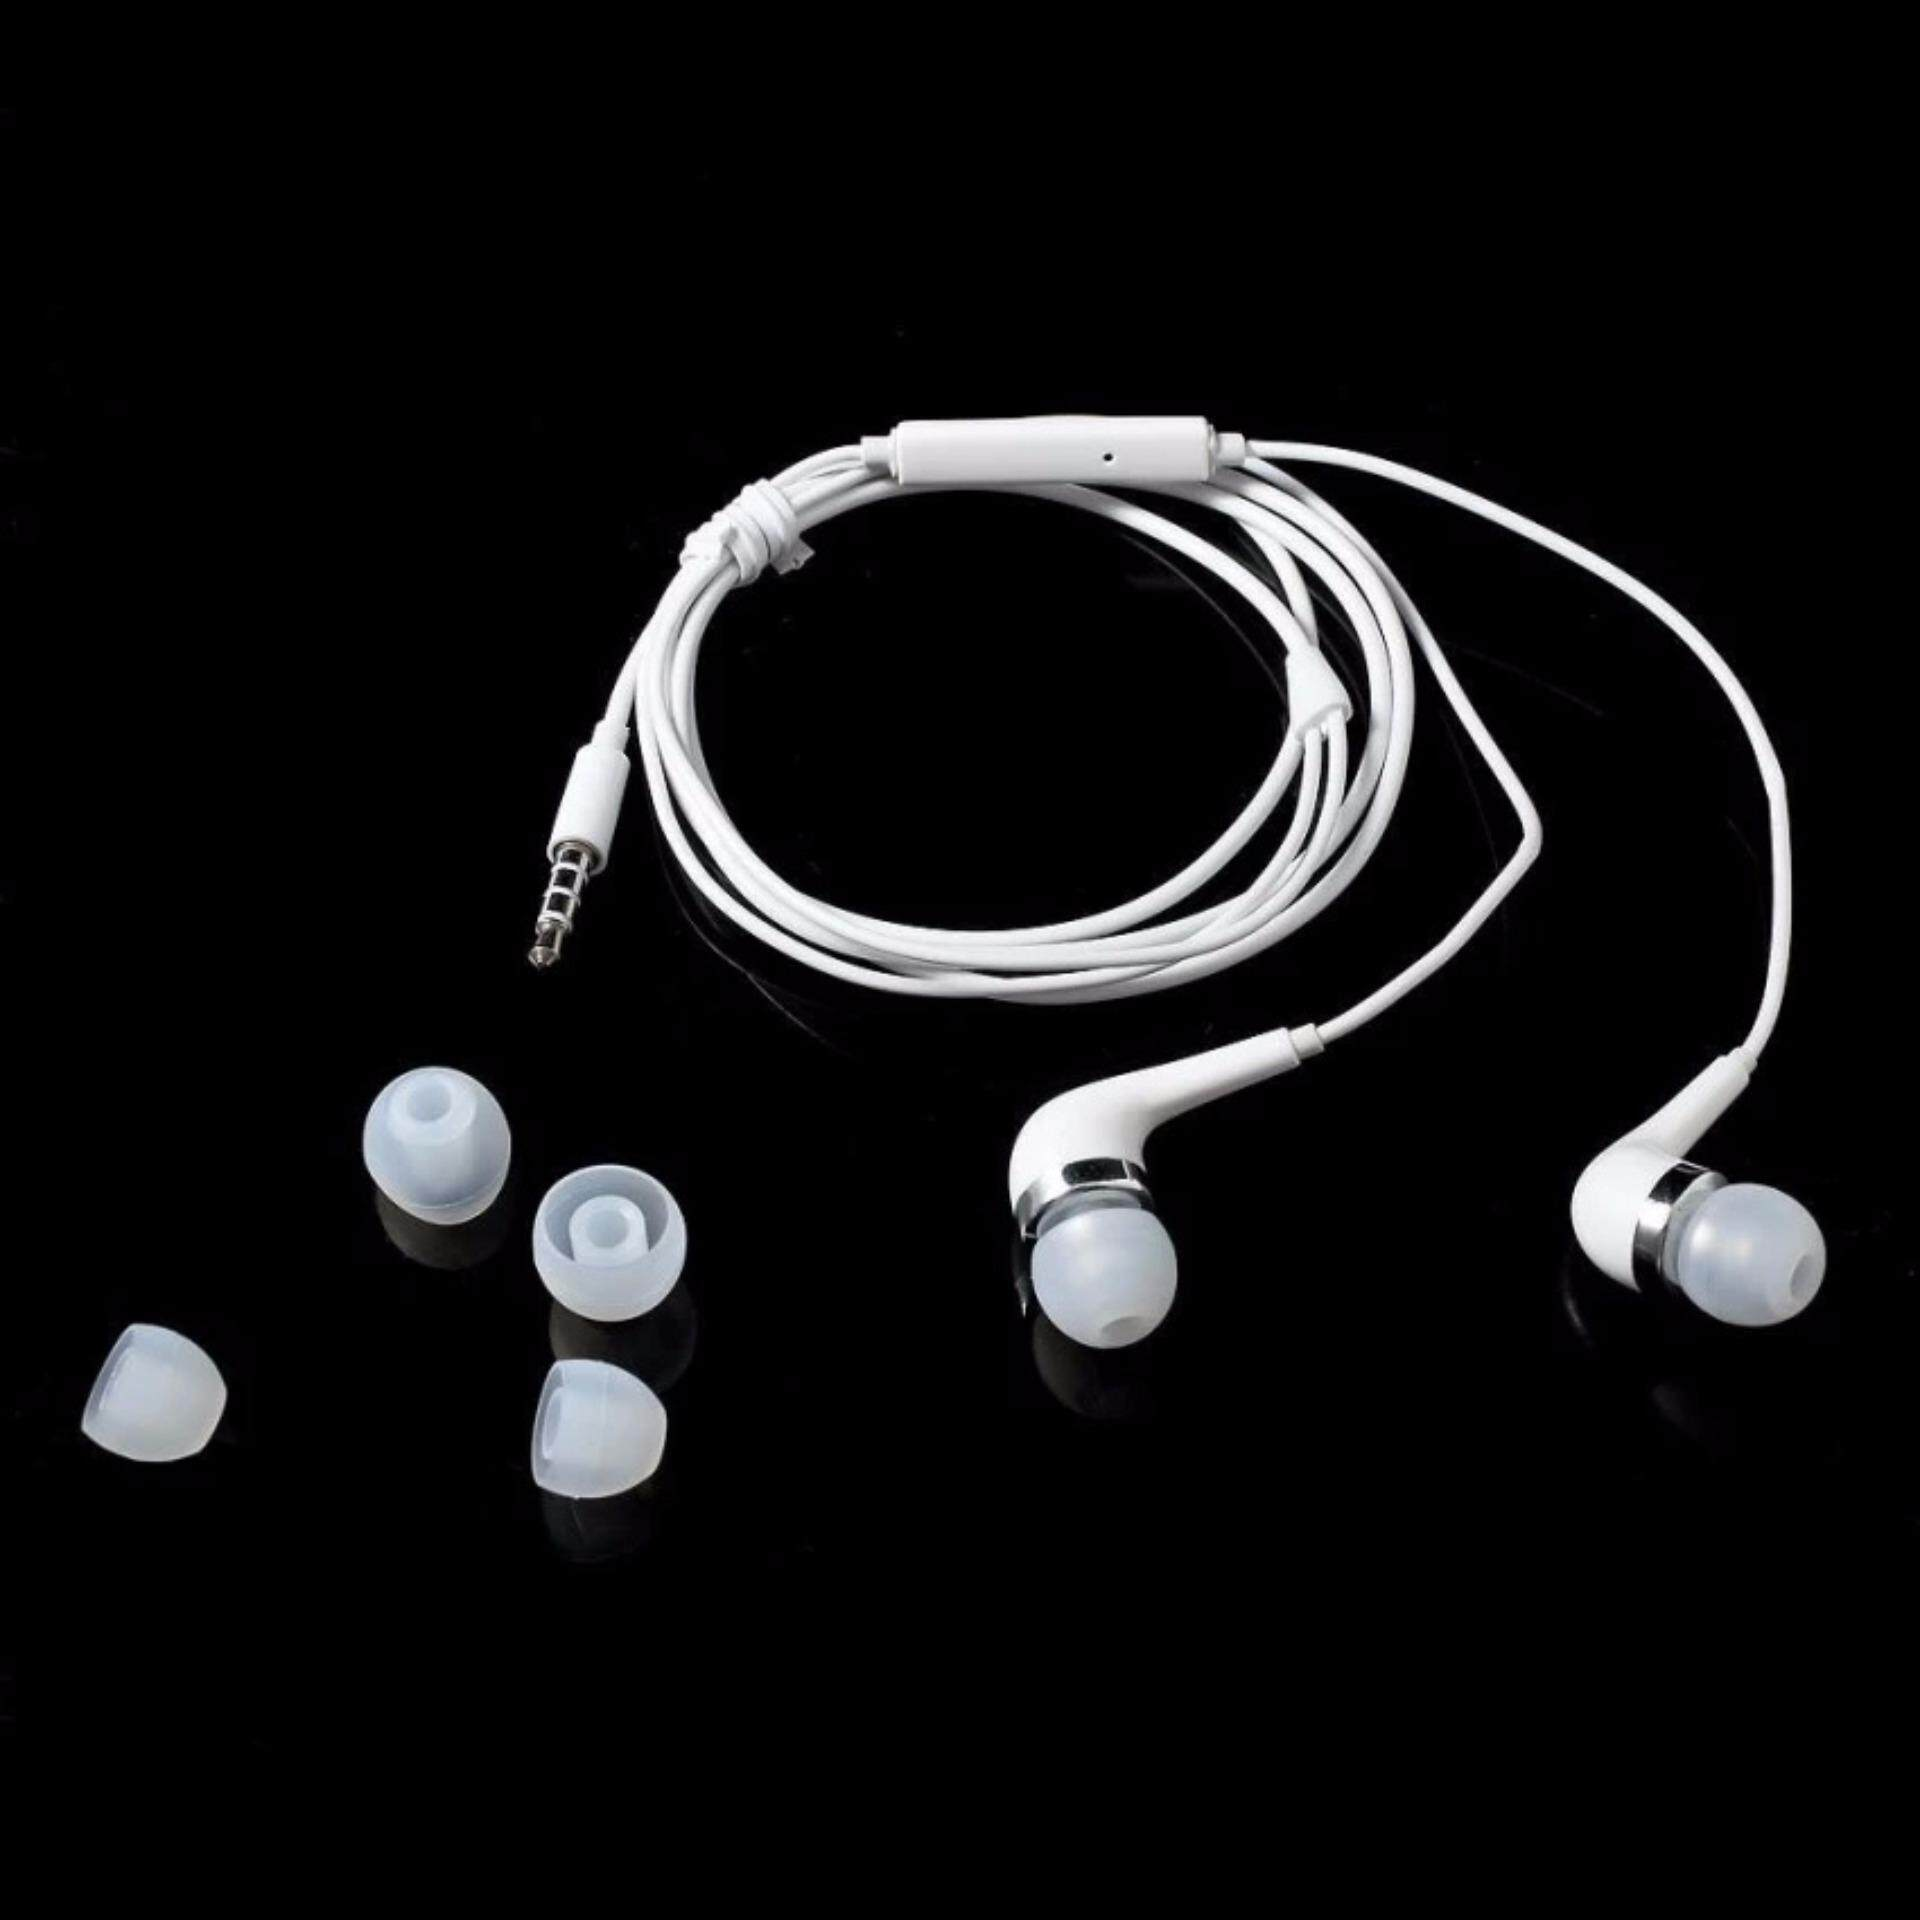 Original Vivo XE600I 3.5mm Stereo Headphone In-ear Earphone with Mic